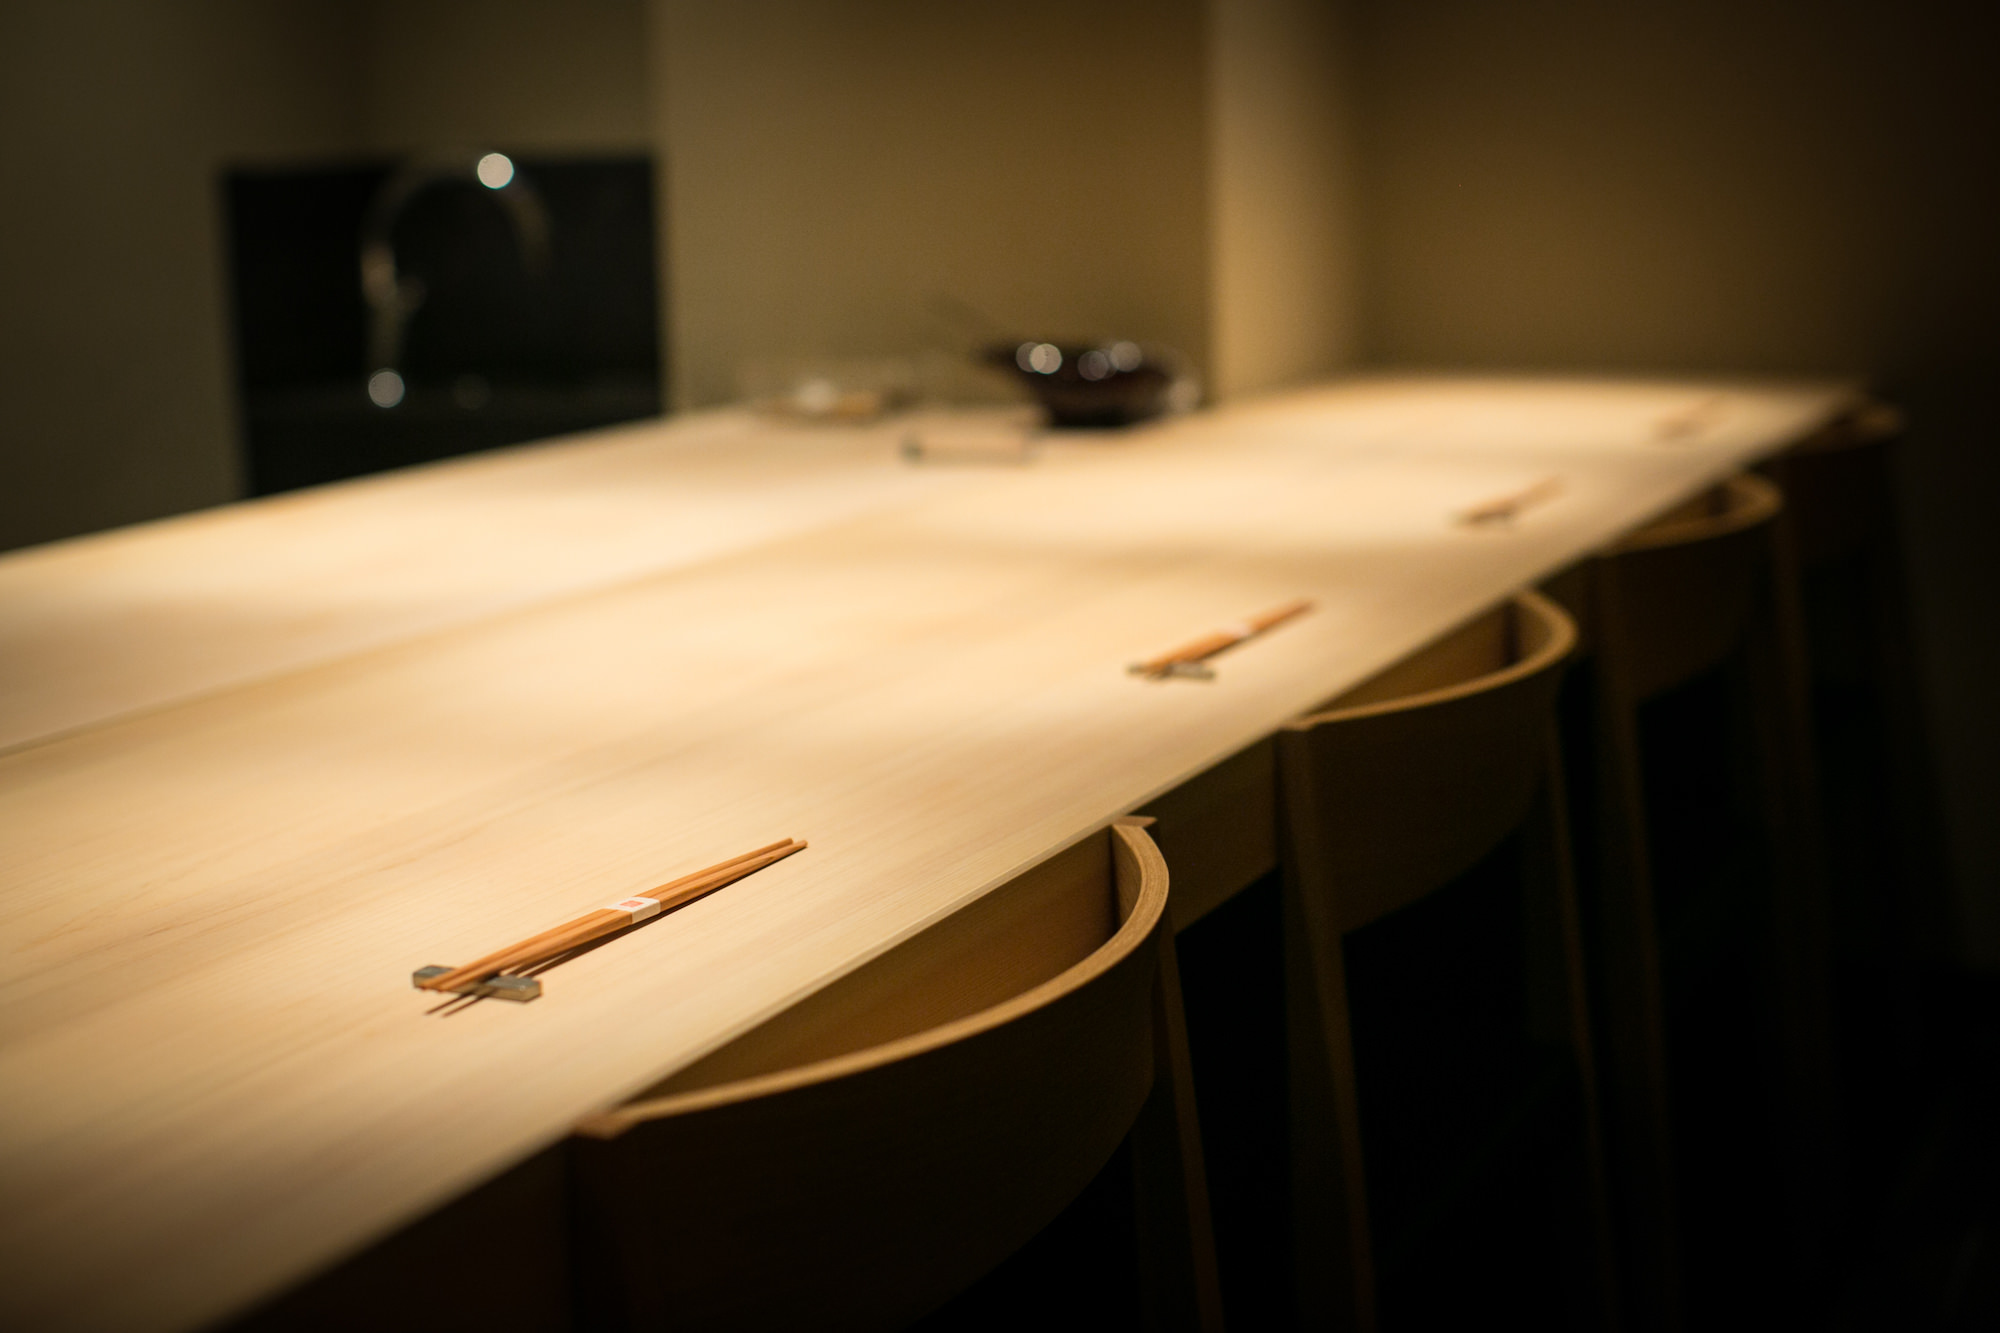 Sushidokoro Kurosugi table-set